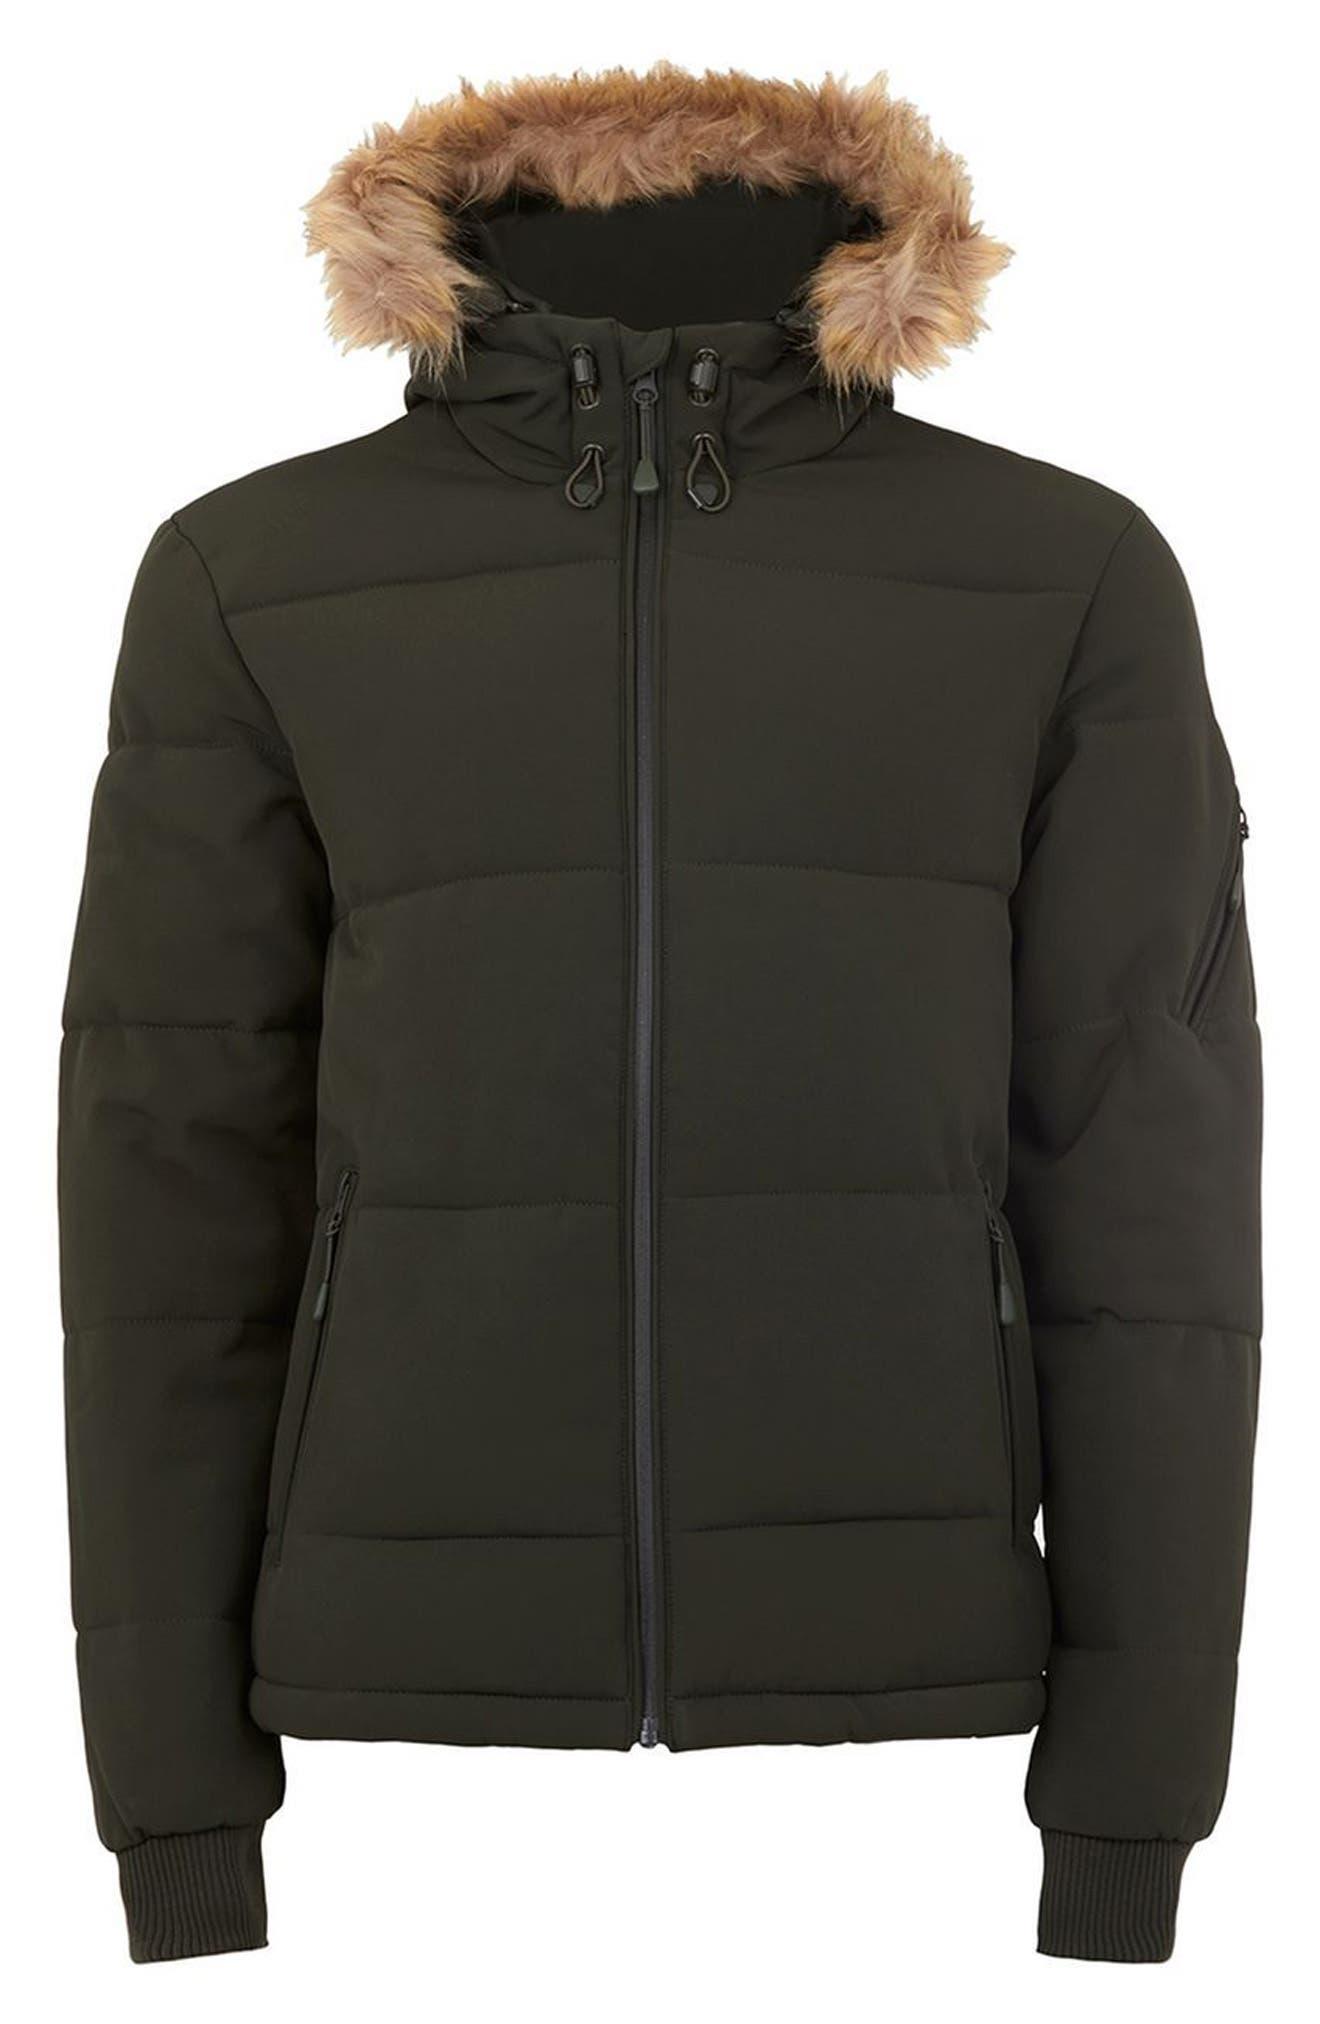 Maguire Faux Fur Trim Puffer Jacket,                             Alternate thumbnail 4, color,                             Green